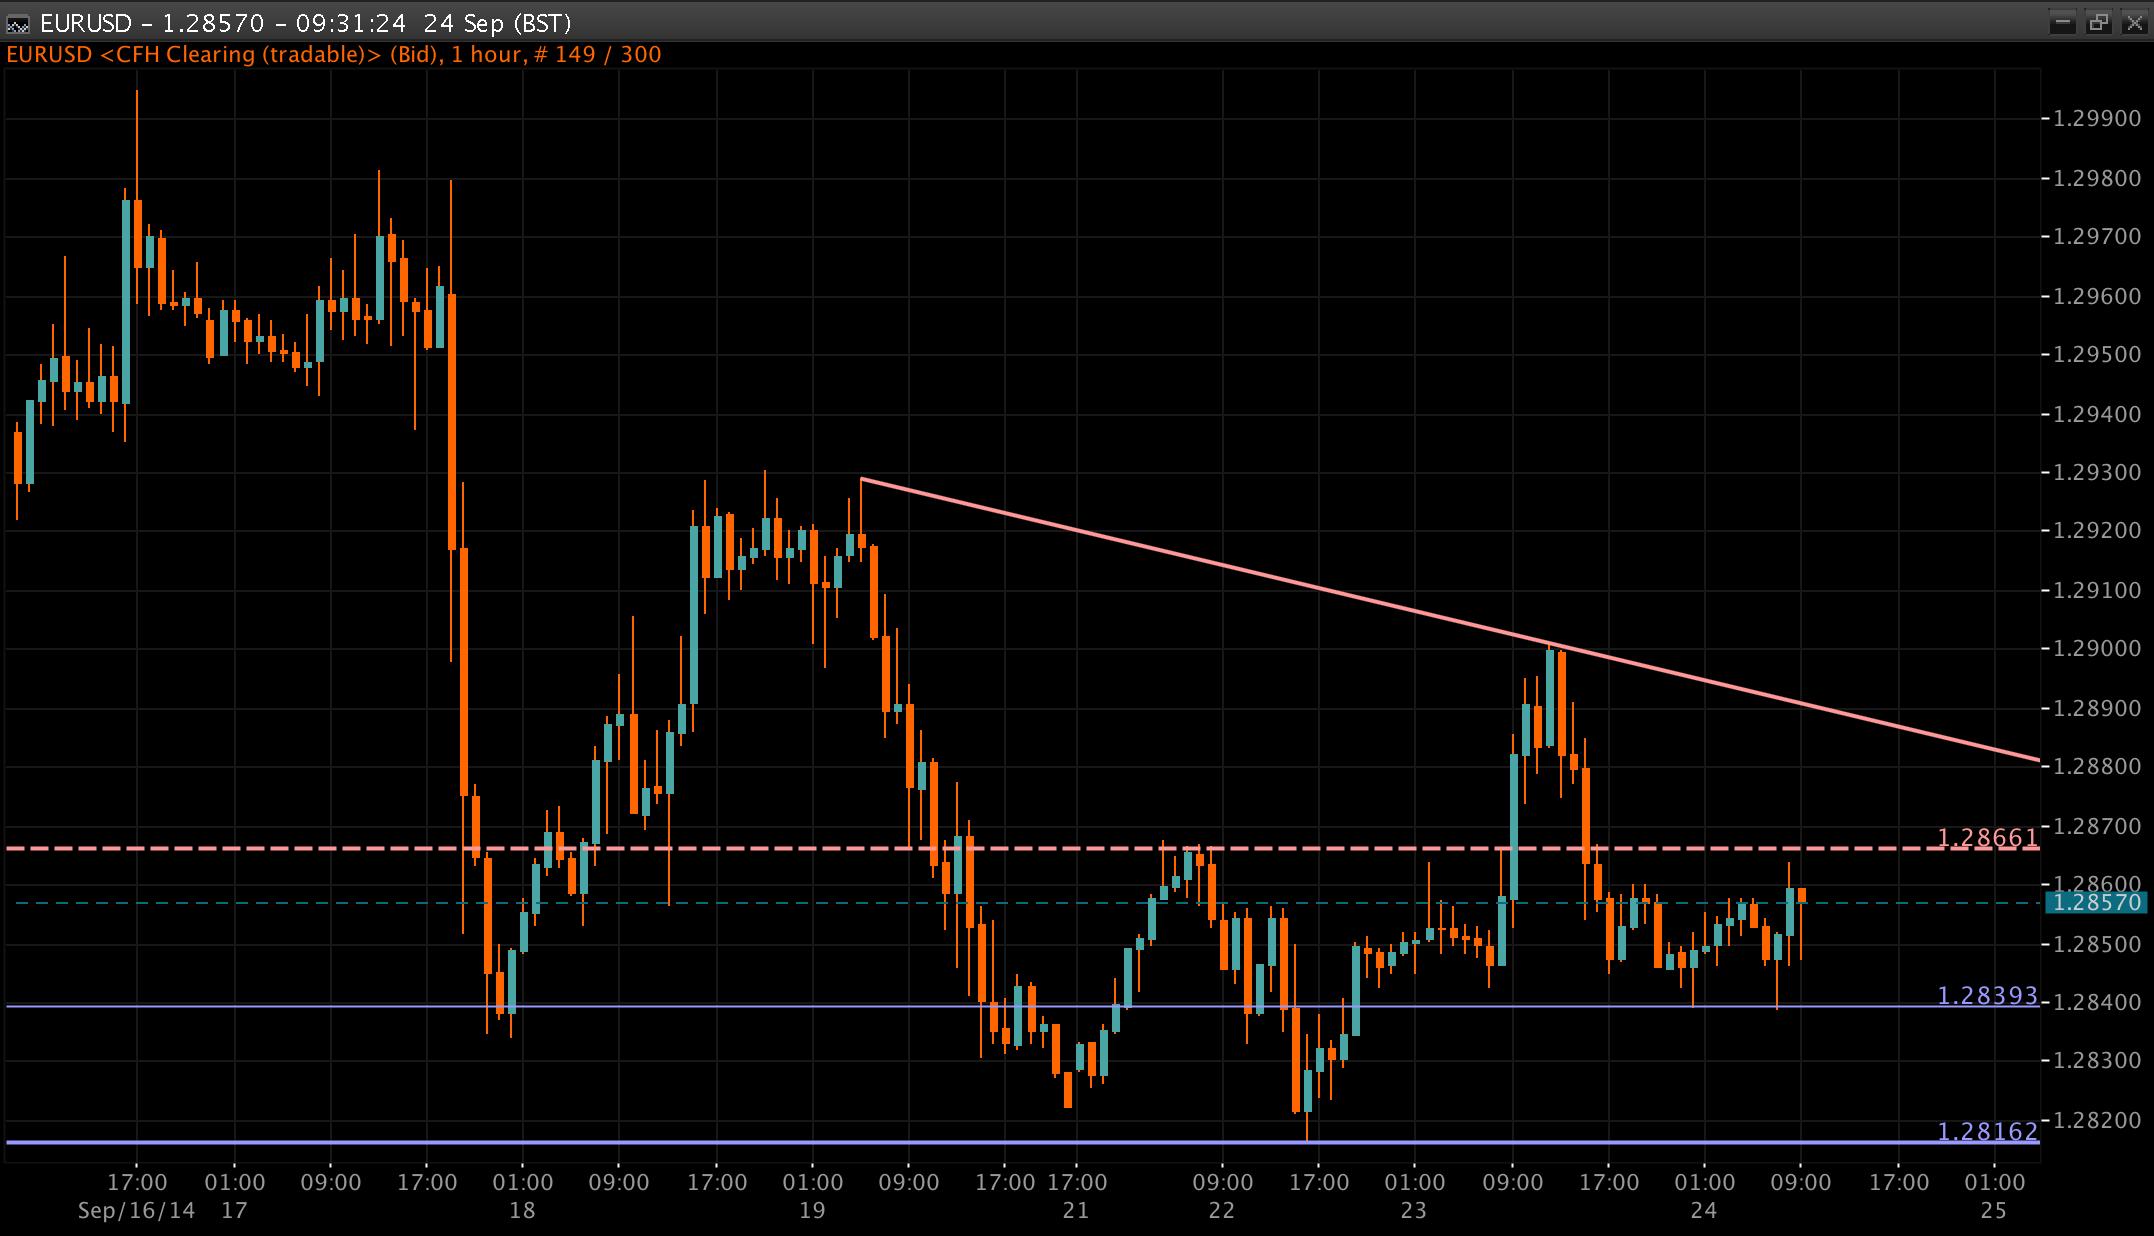 EUR/USD Chart 24 Sep 2014